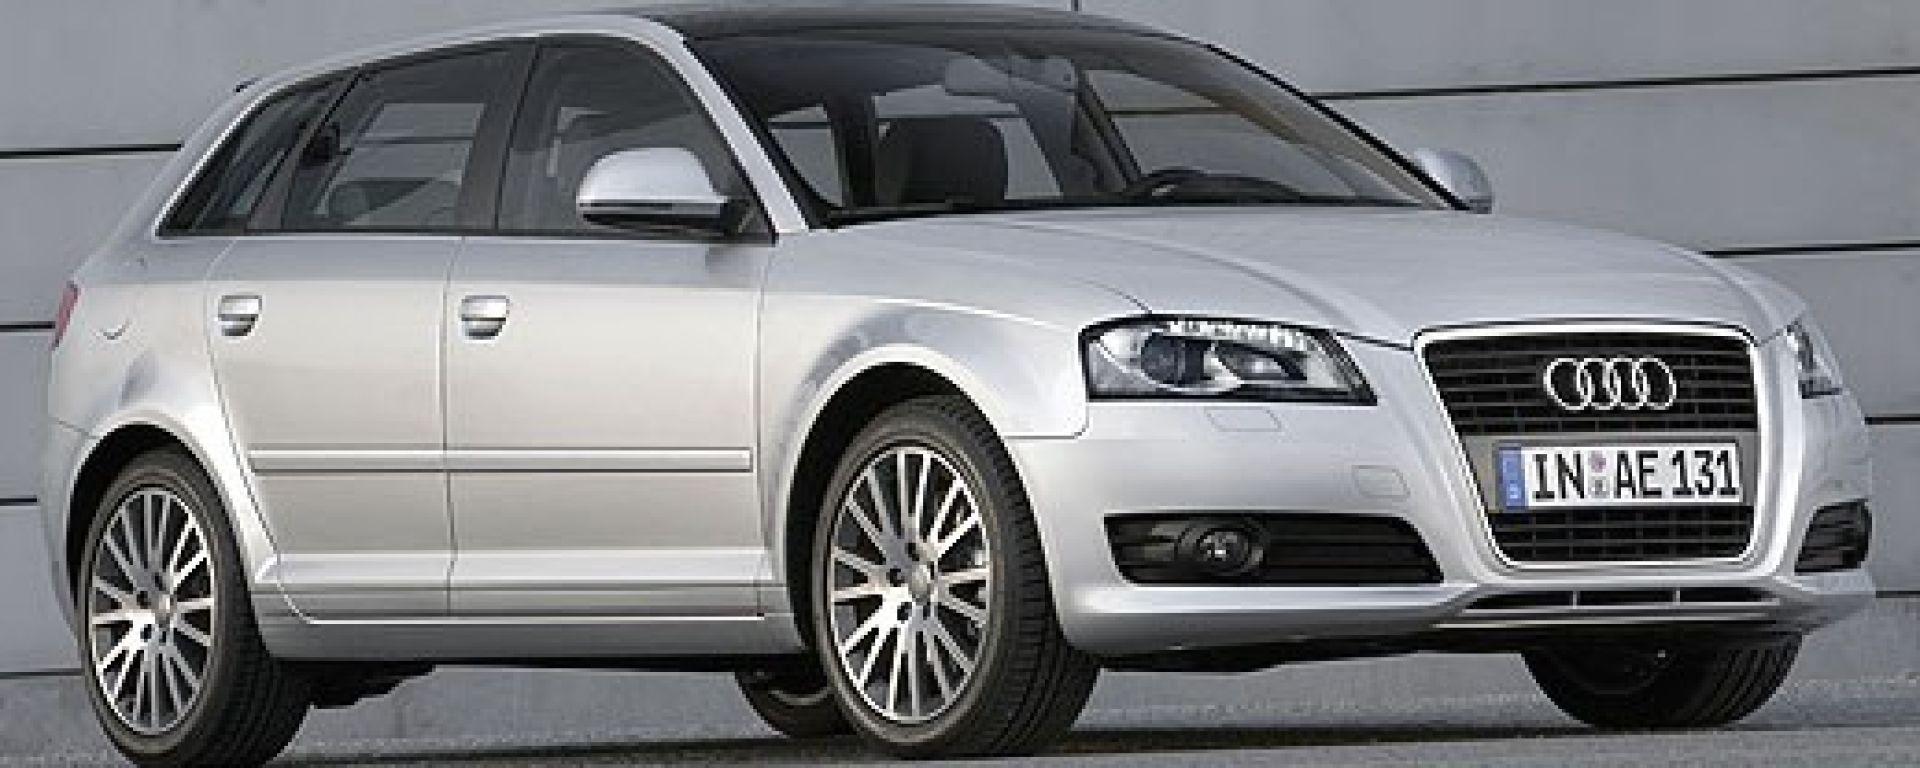 Prova  Audi A3  S3 E Sportback 2008